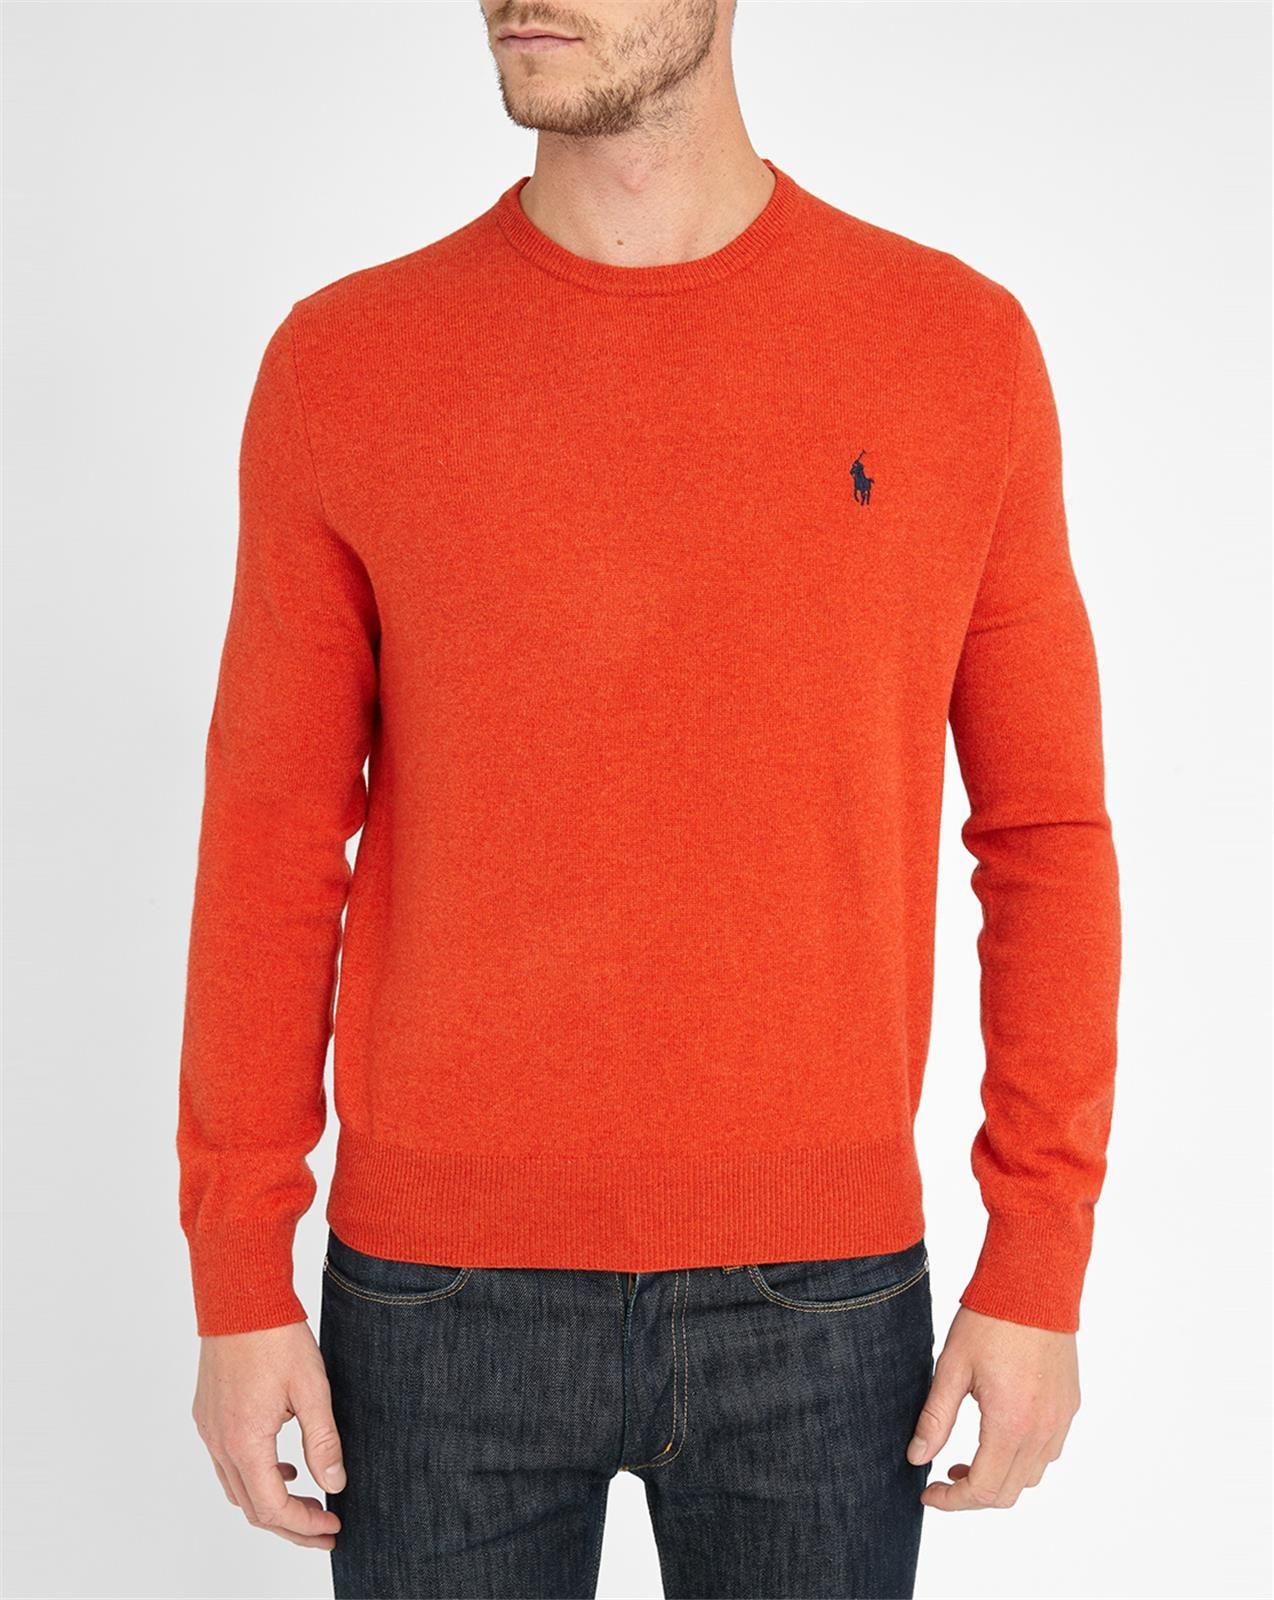 polo ralph lauren orange lambswool round neck sweater in. Black Bedroom Furniture Sets. Home Design Ideas